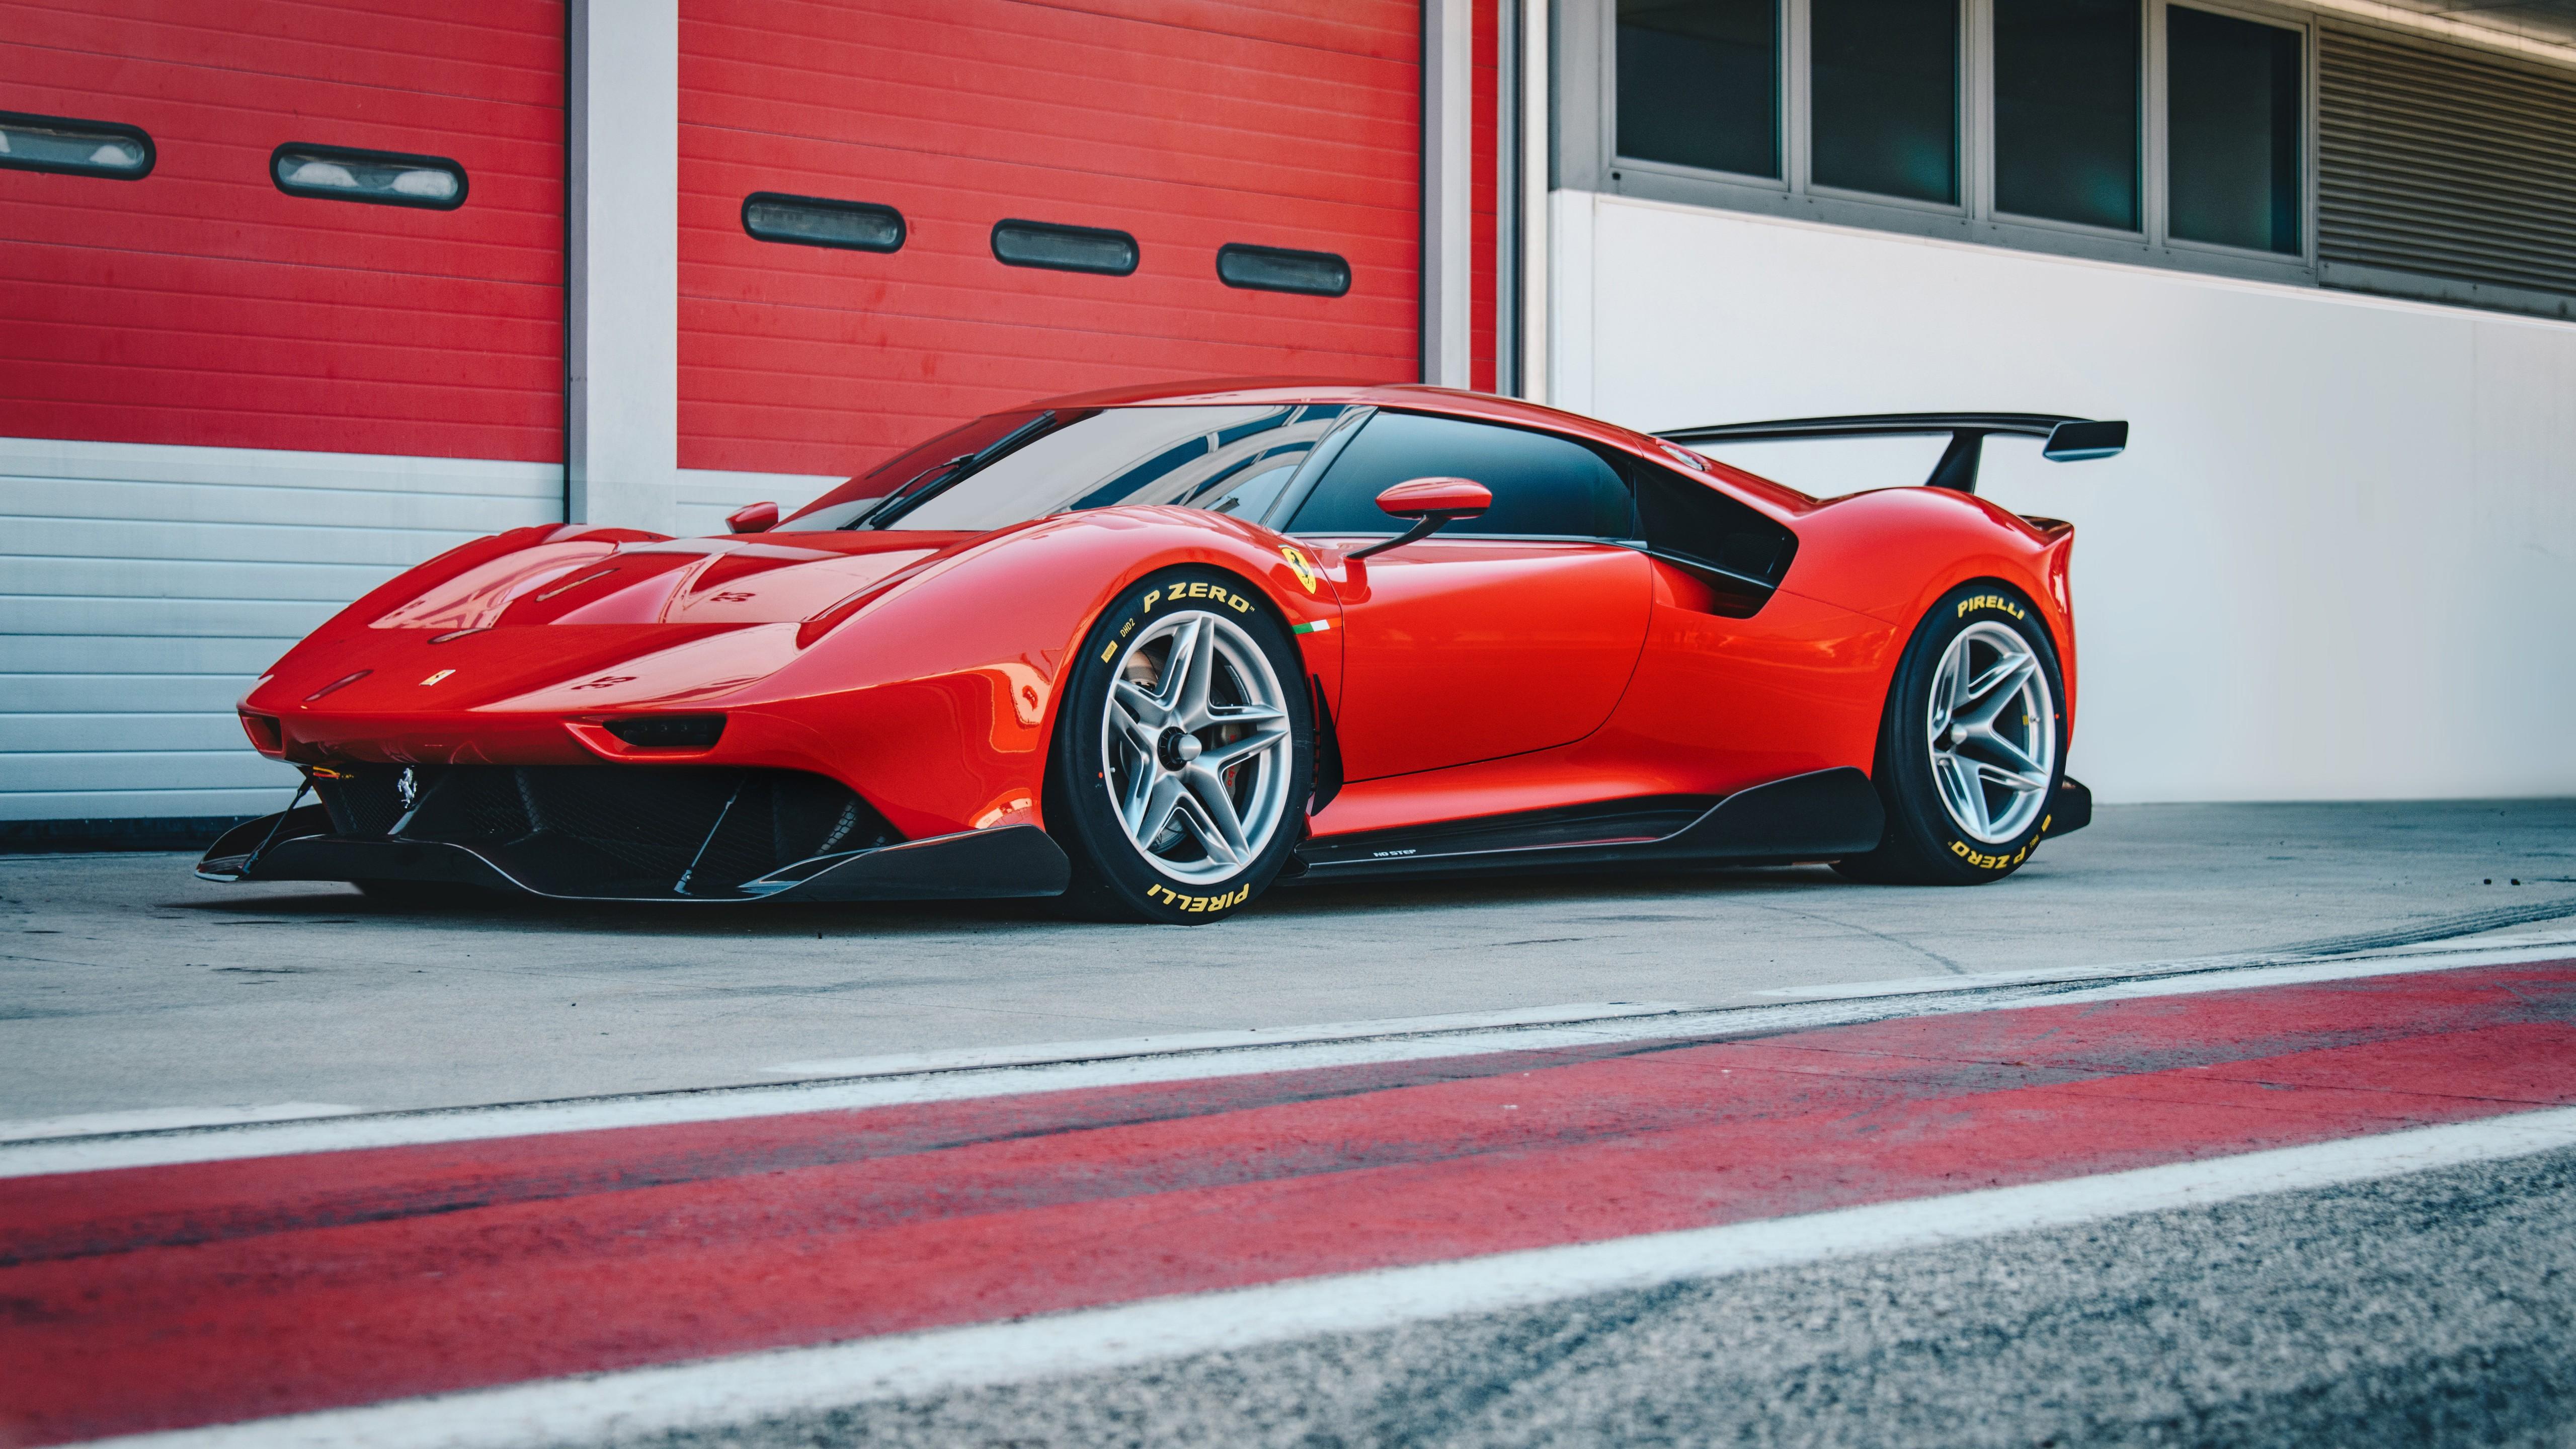 Ferrari P80c 2019 4k 8k Wallpaper Hd Car Wallpapers Id 12316